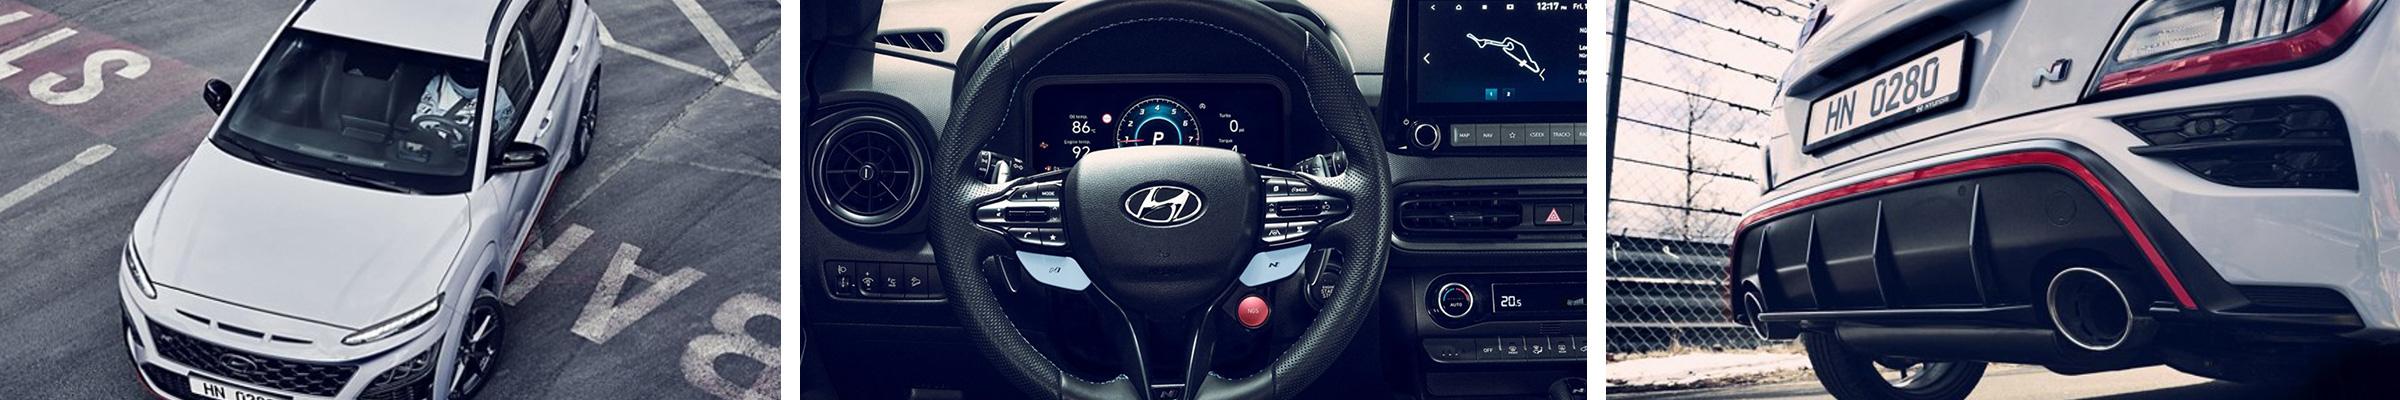 2022 Hyundai Kona N For Sale Dearborn MI   Detroit